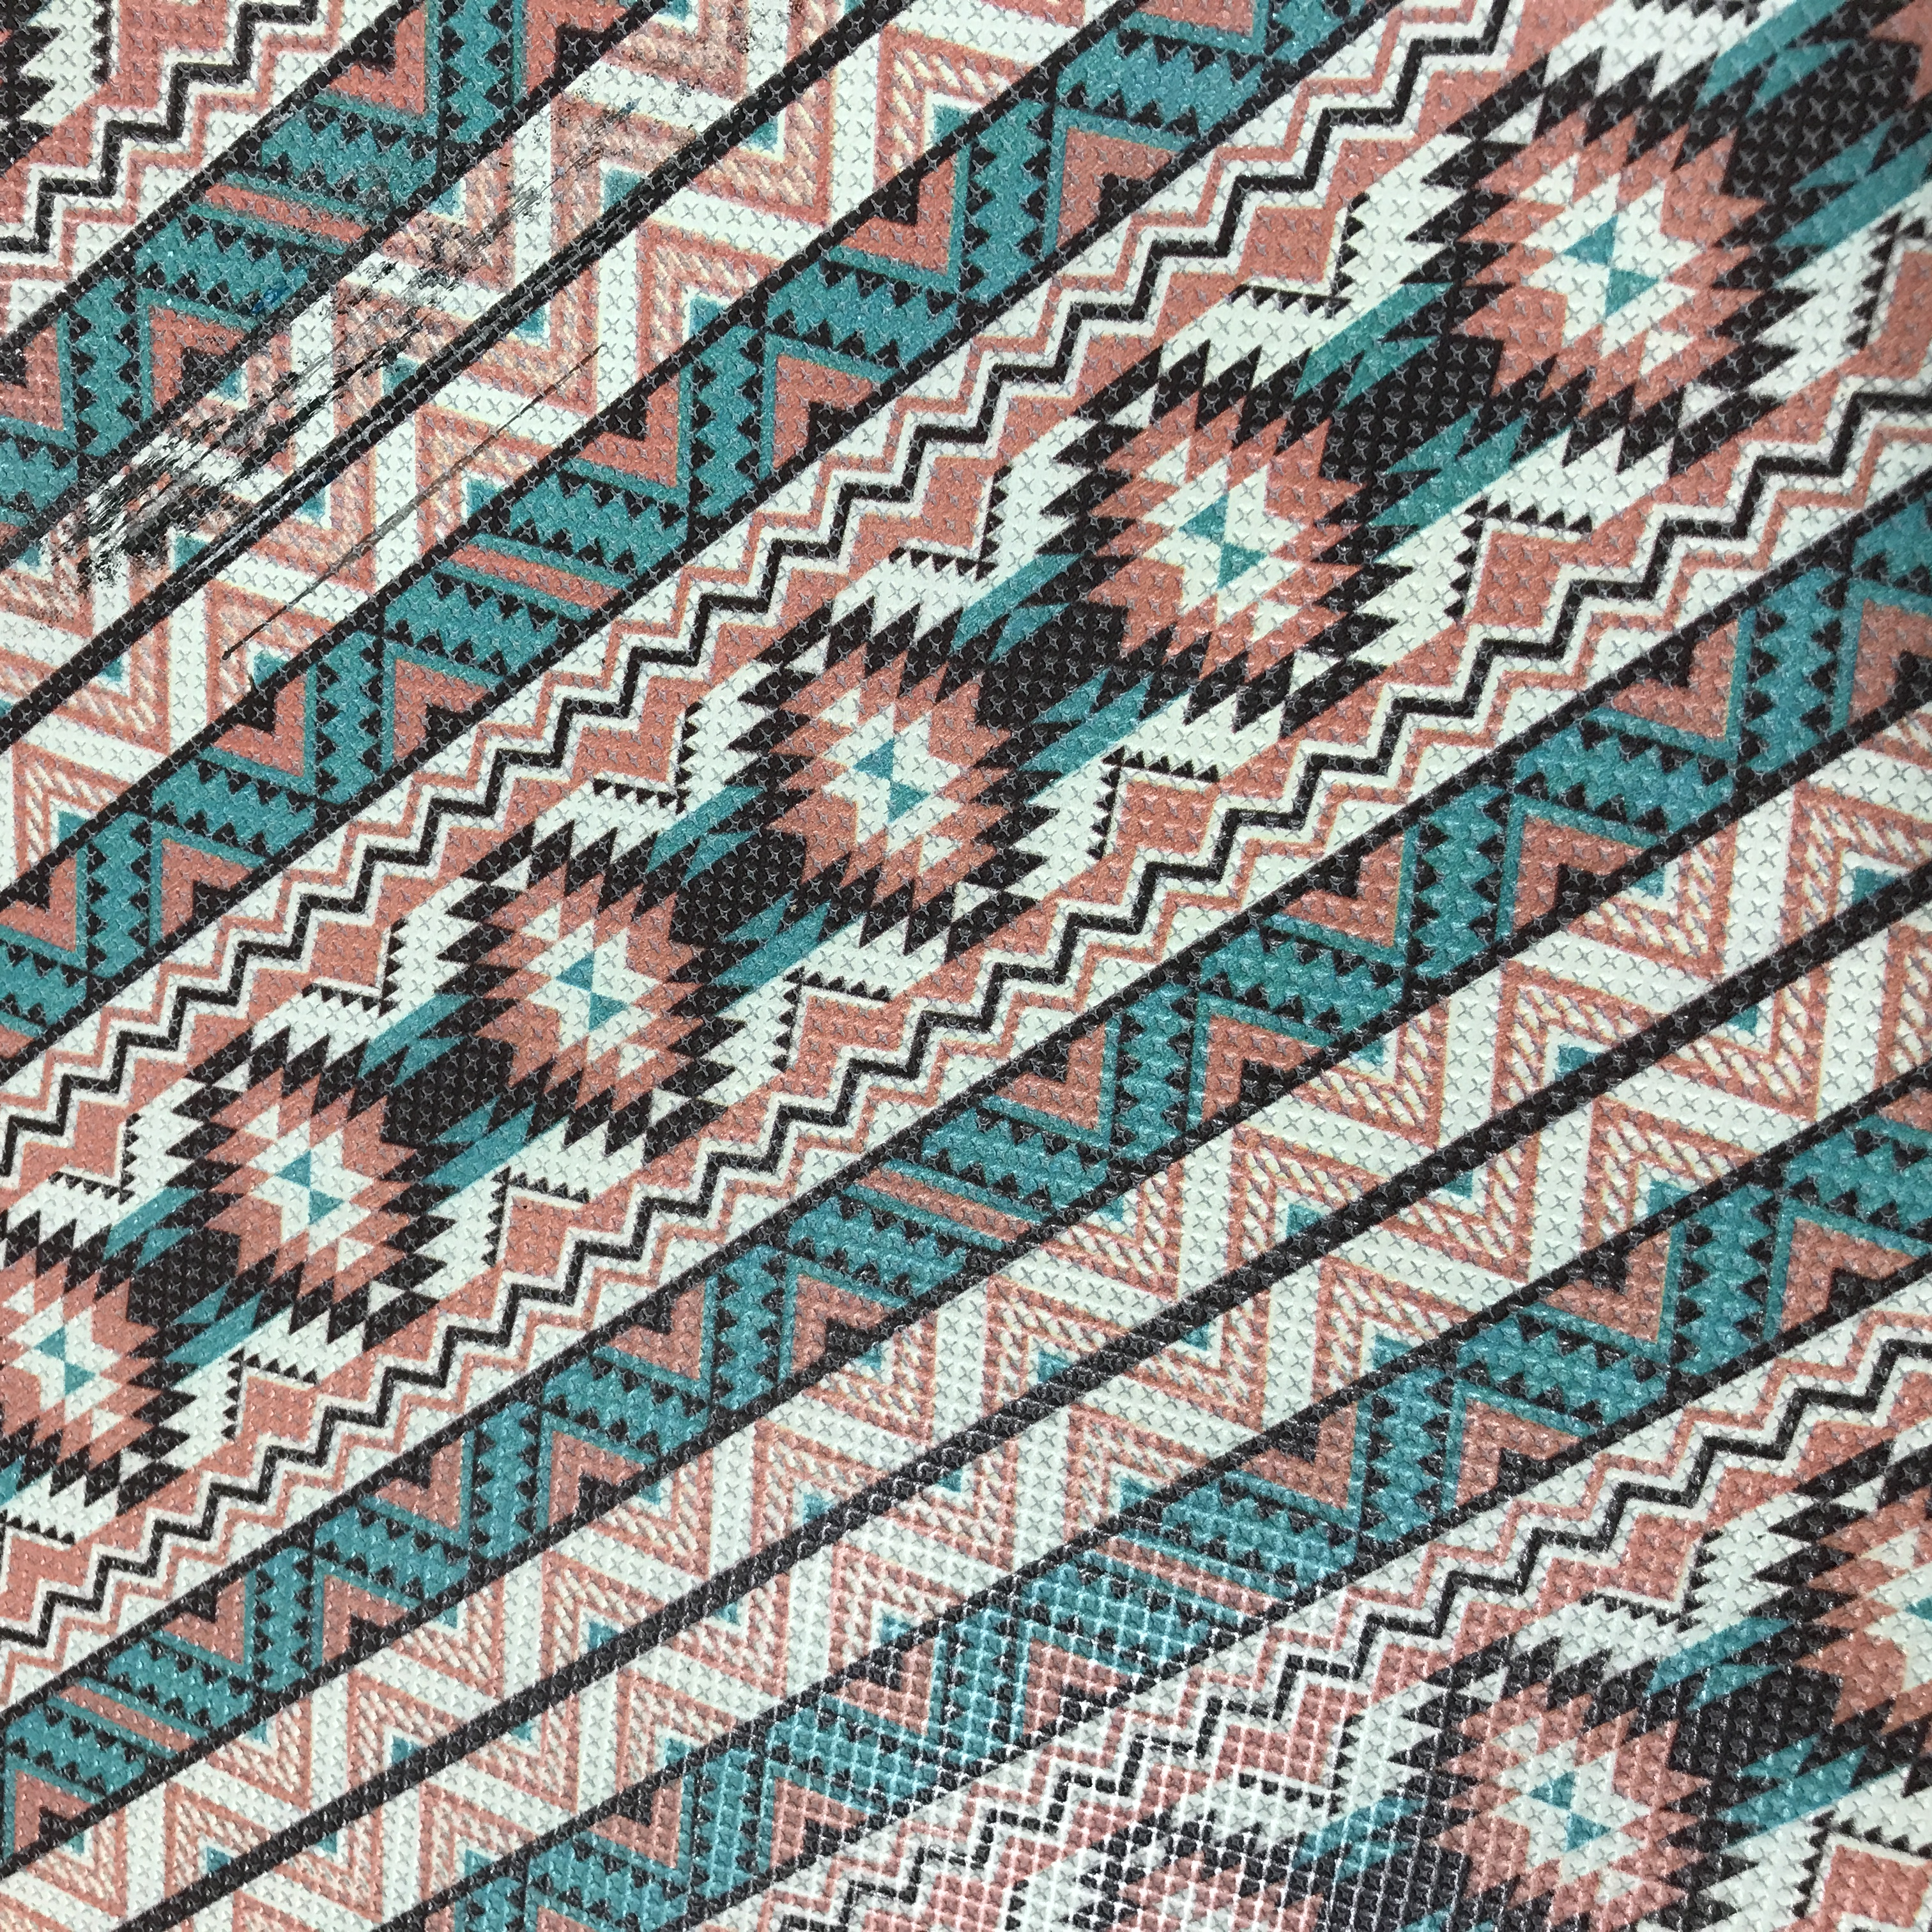 Coral & Turquoise Aztec